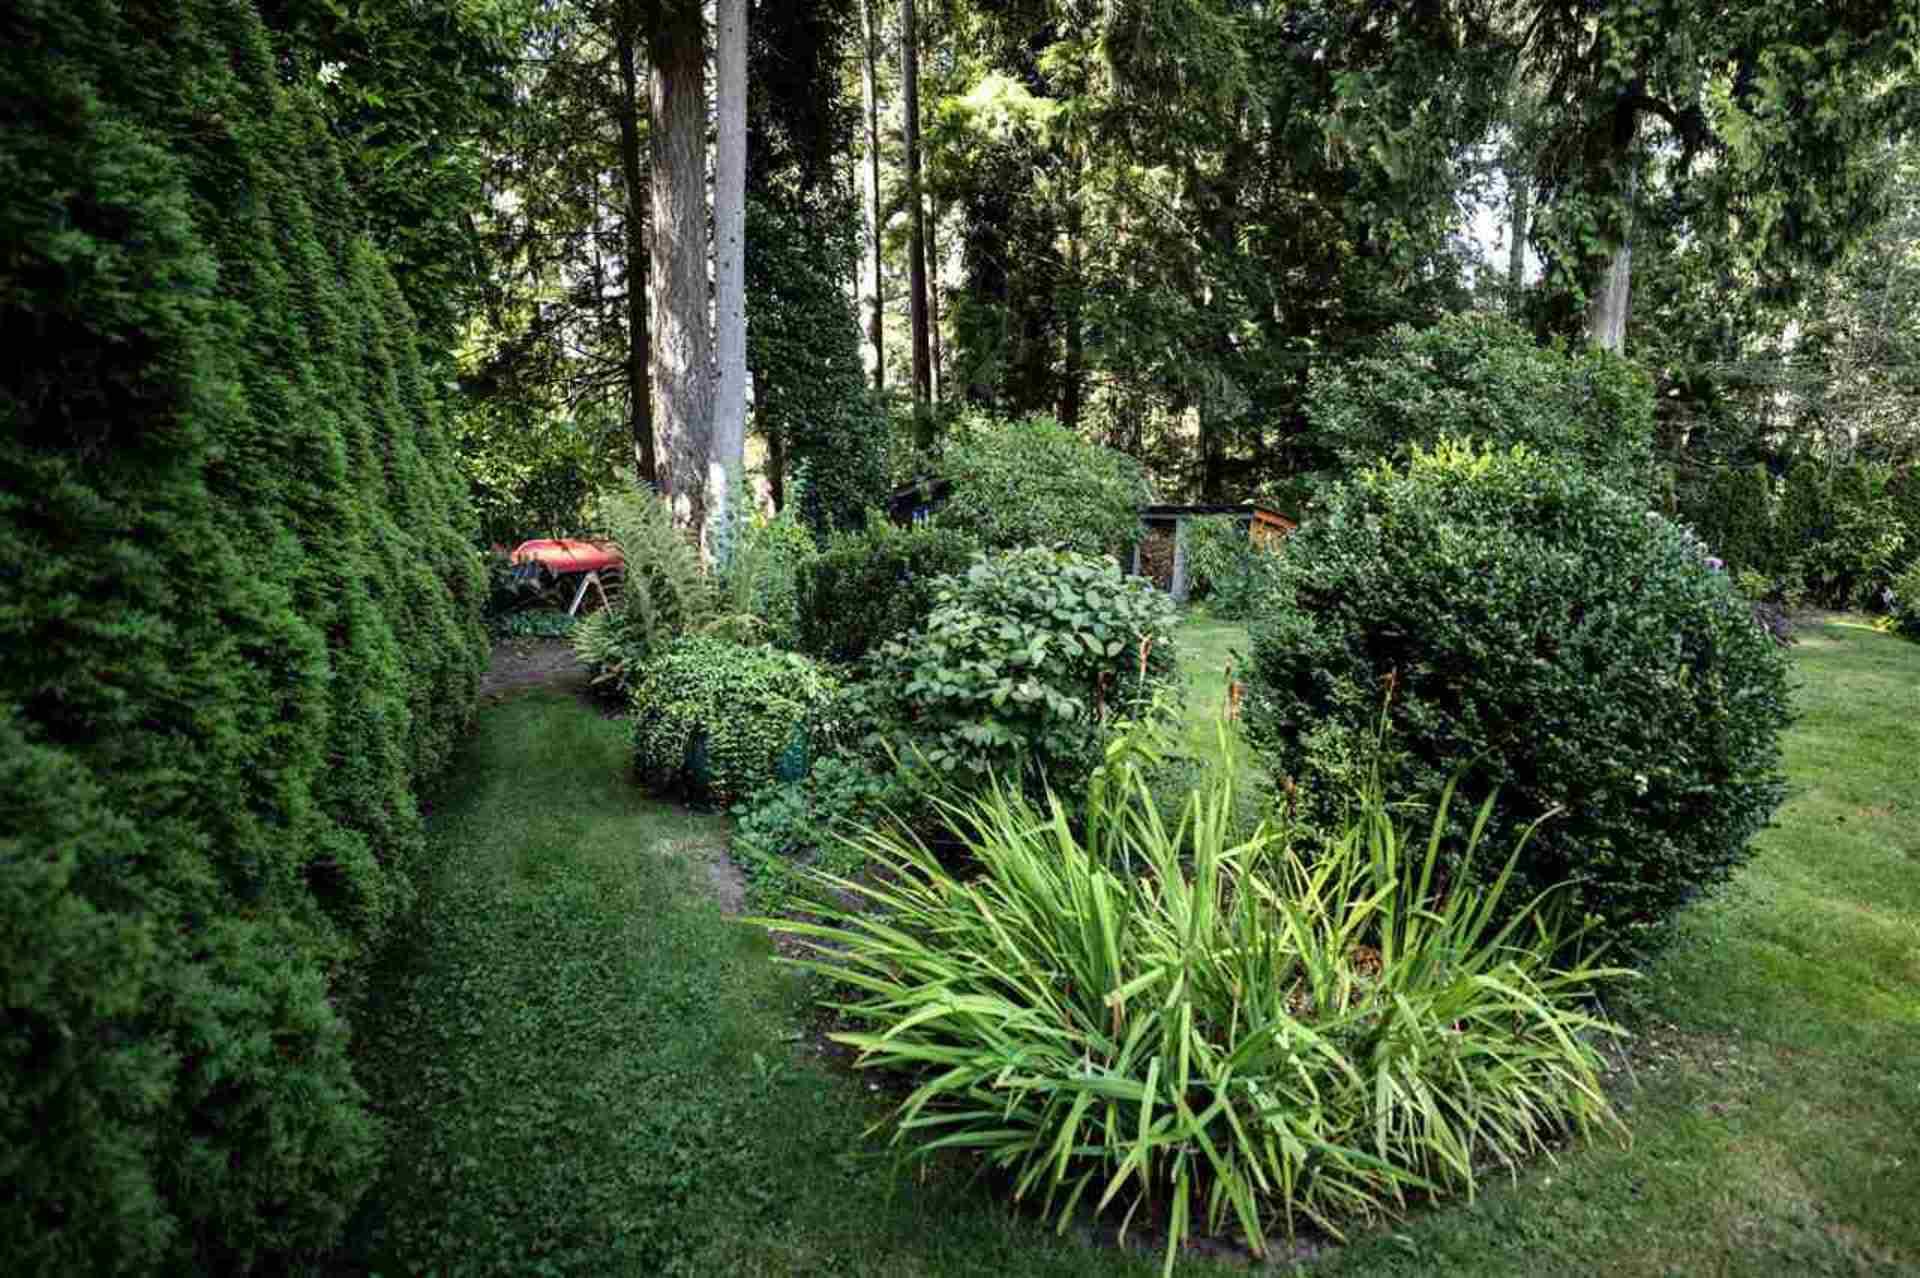 2491-kilmarnock-crescent-lynn-valley-north-vancouver-05 at 2491 Kilmarnock Crescent, Lynn Valley, North Vancouver